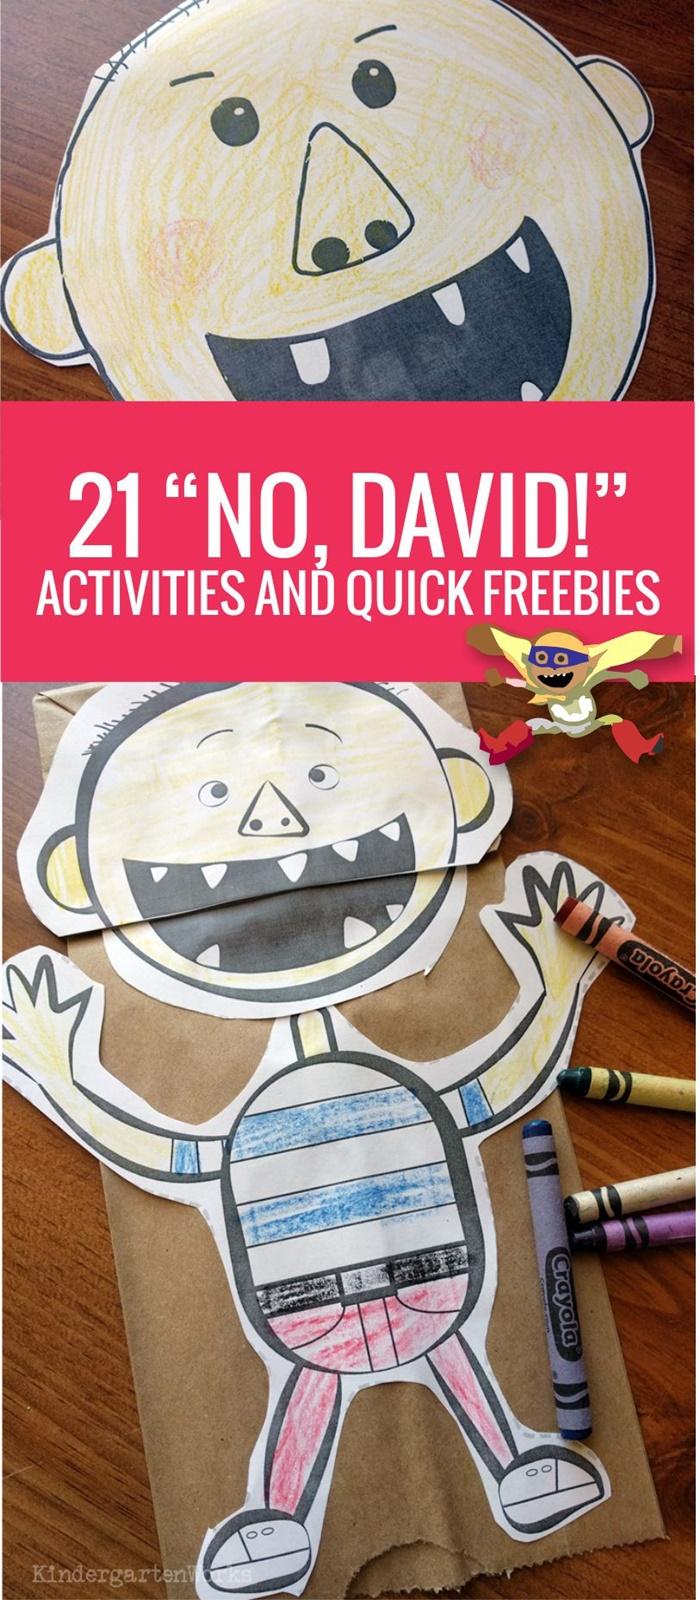 21 No David Activities and Quick Freebies